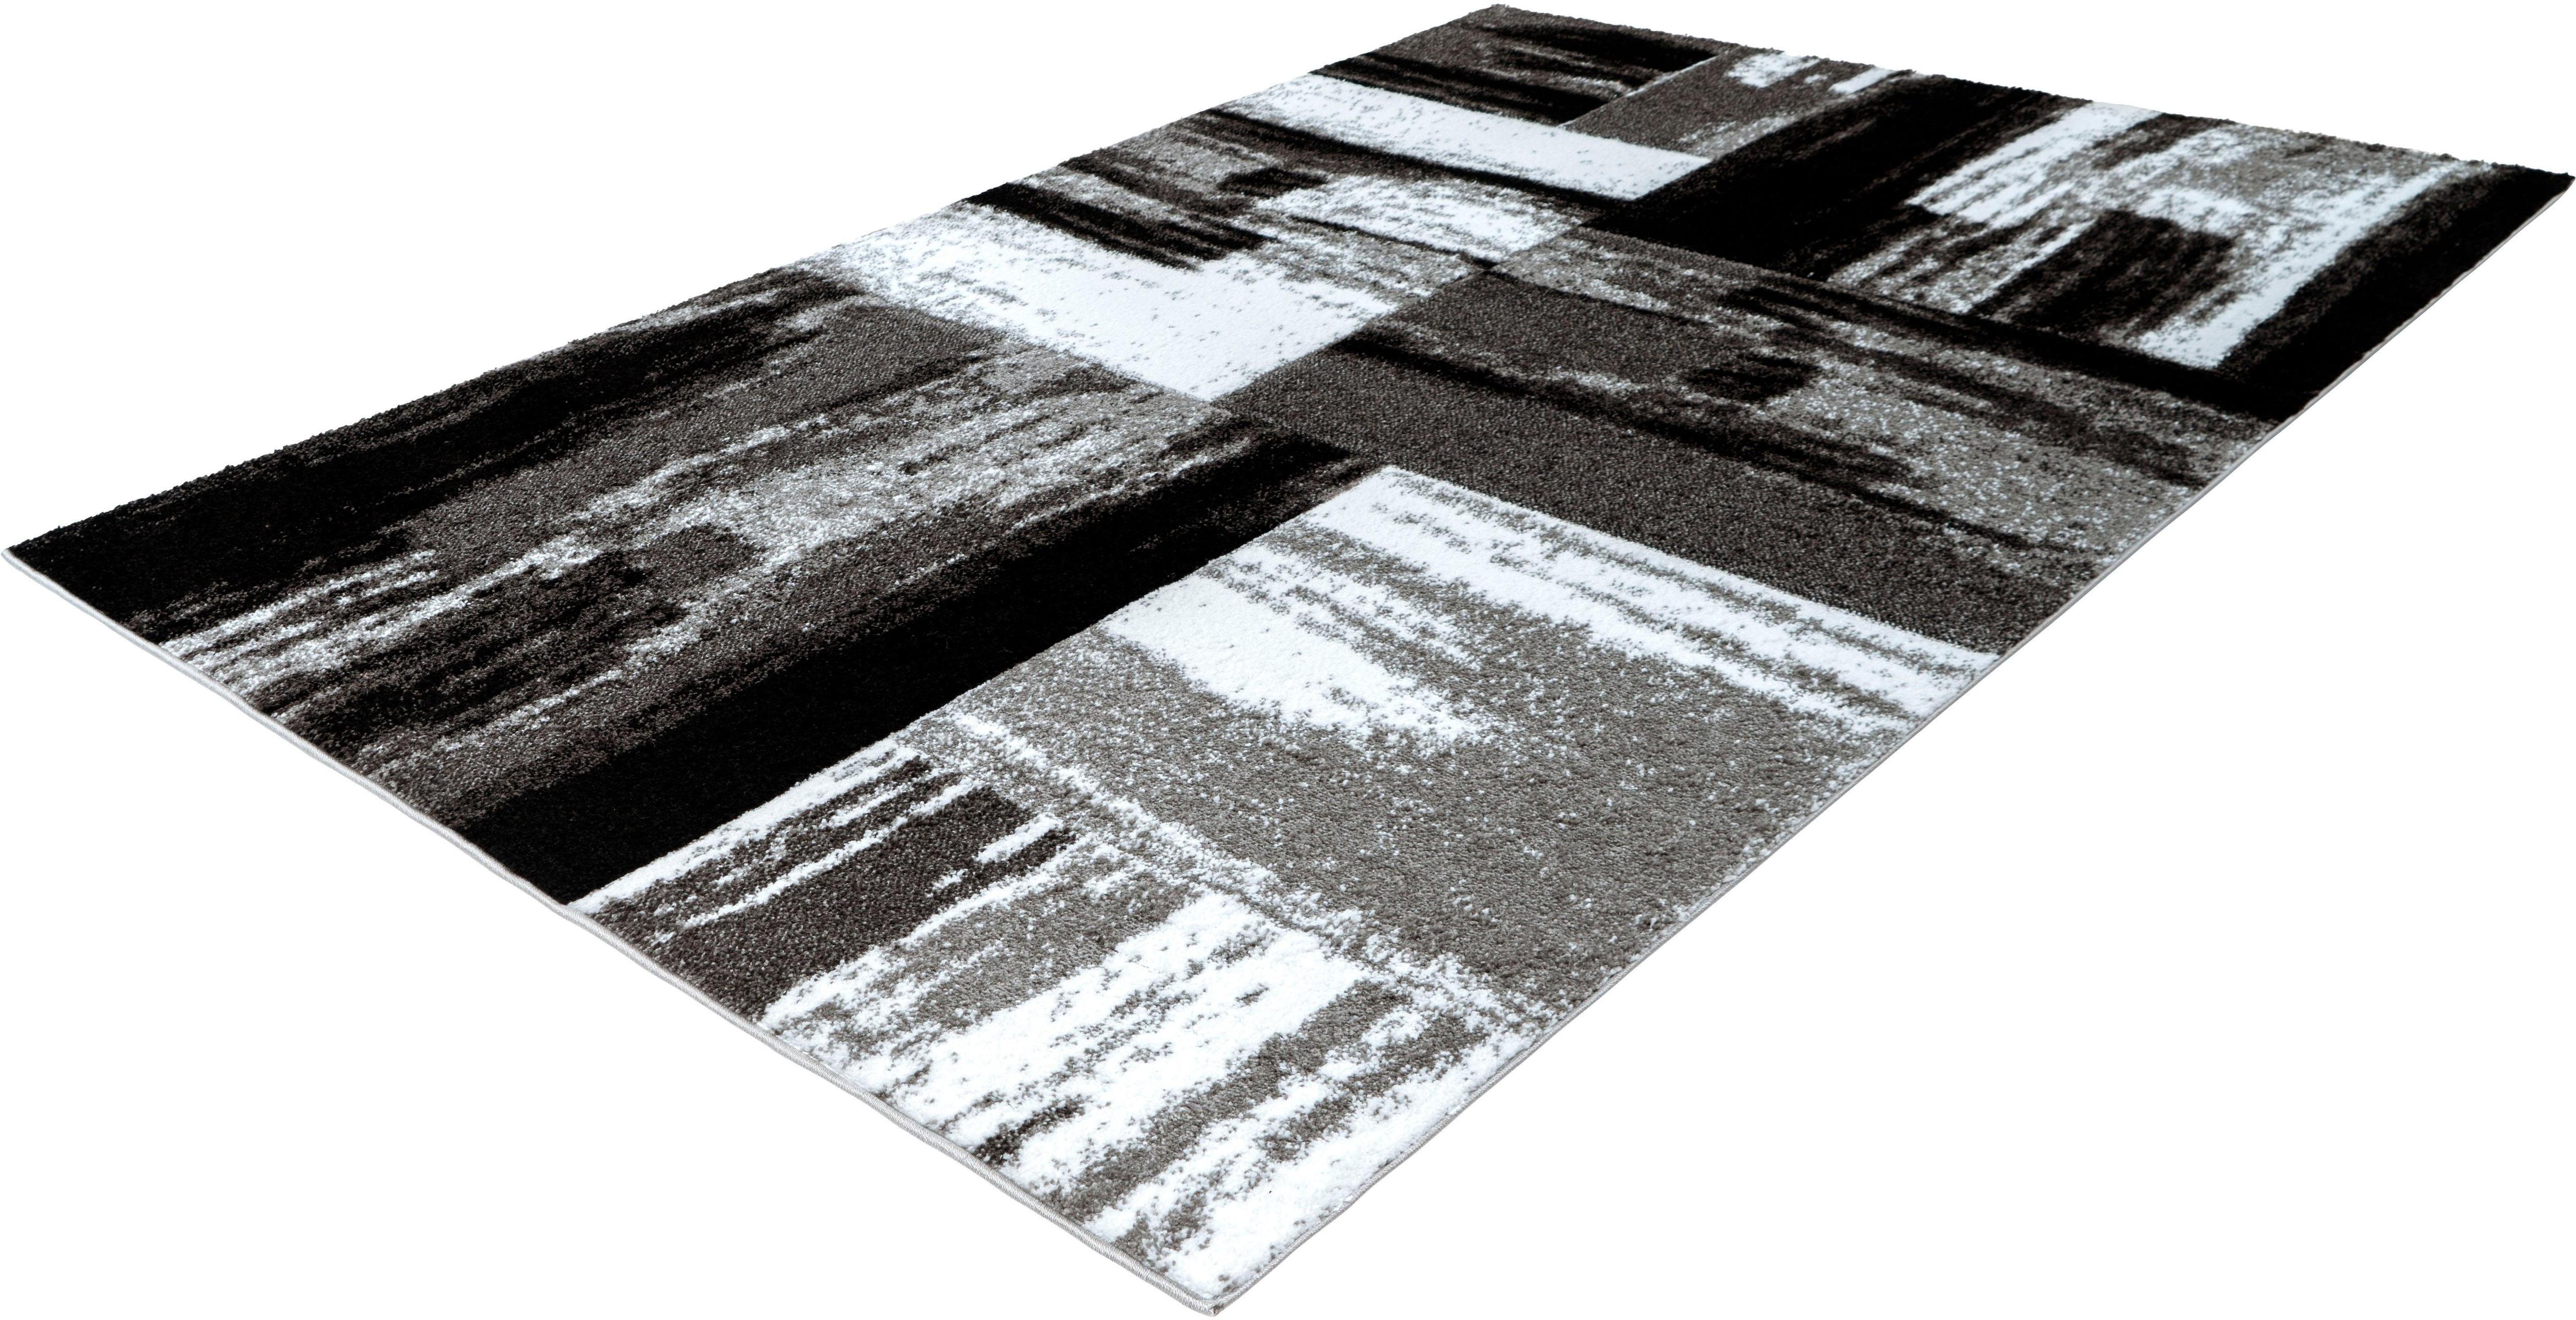 Teppich Astro 300 calo-deluxe rechteckig Höhe 14 mm maschinell gewebt